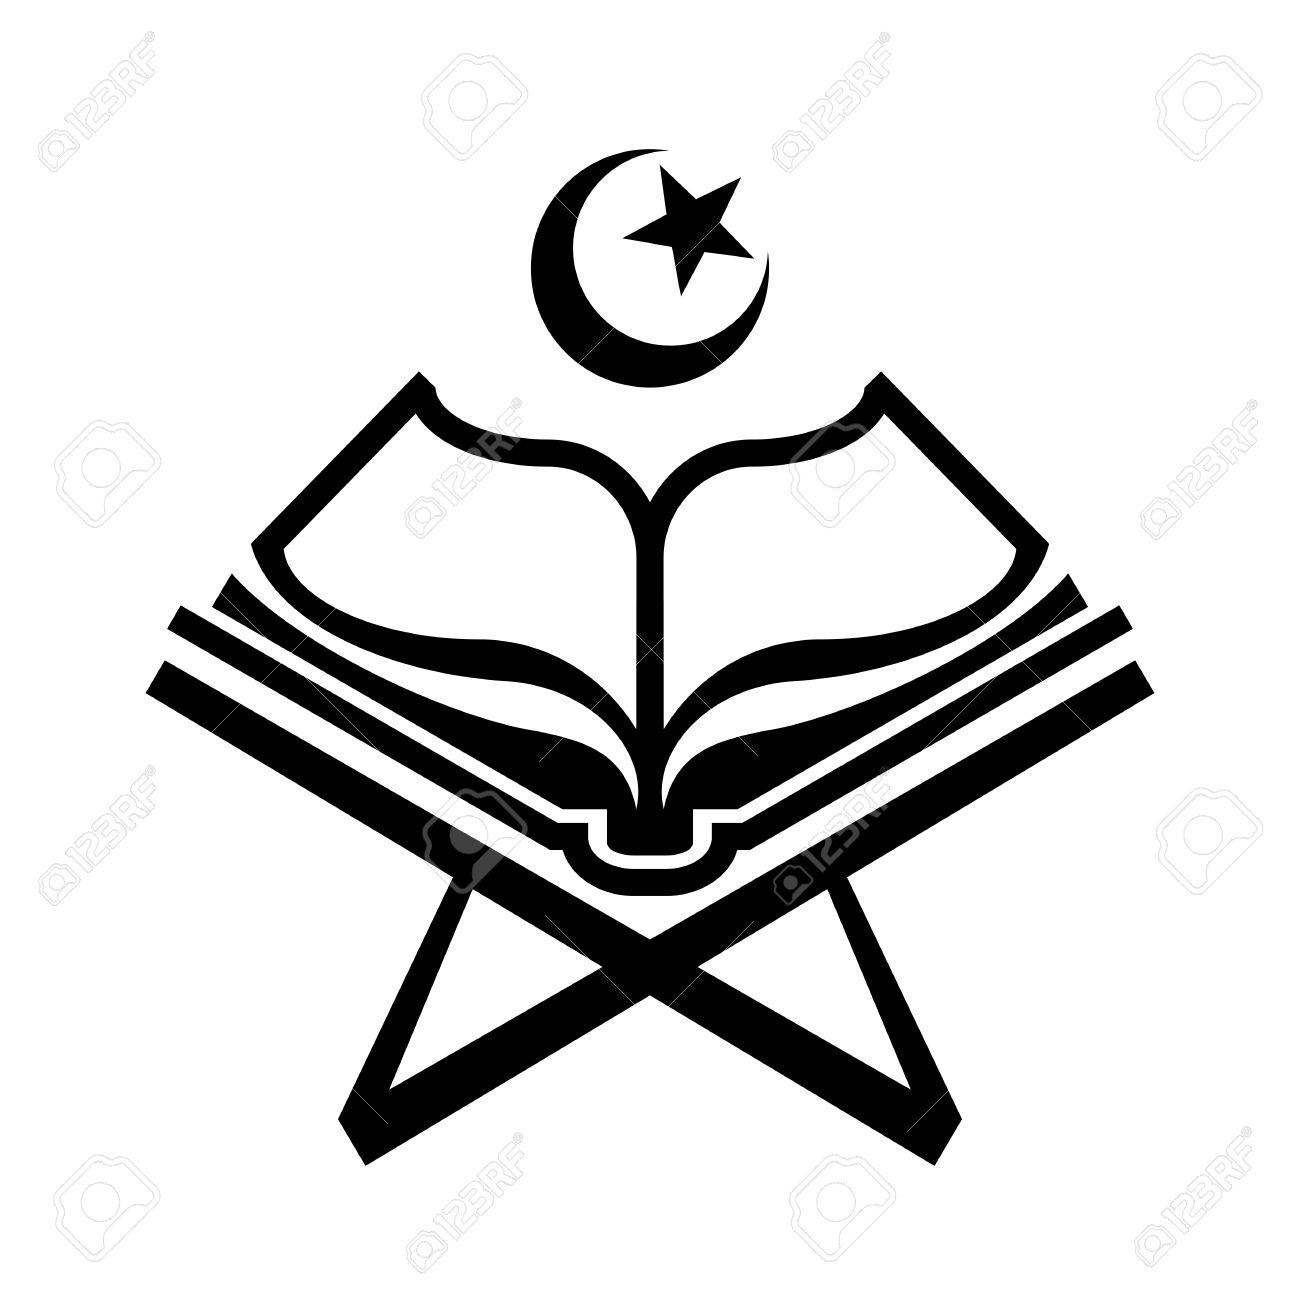 al quran quran koran islam religion book pattern isolated on